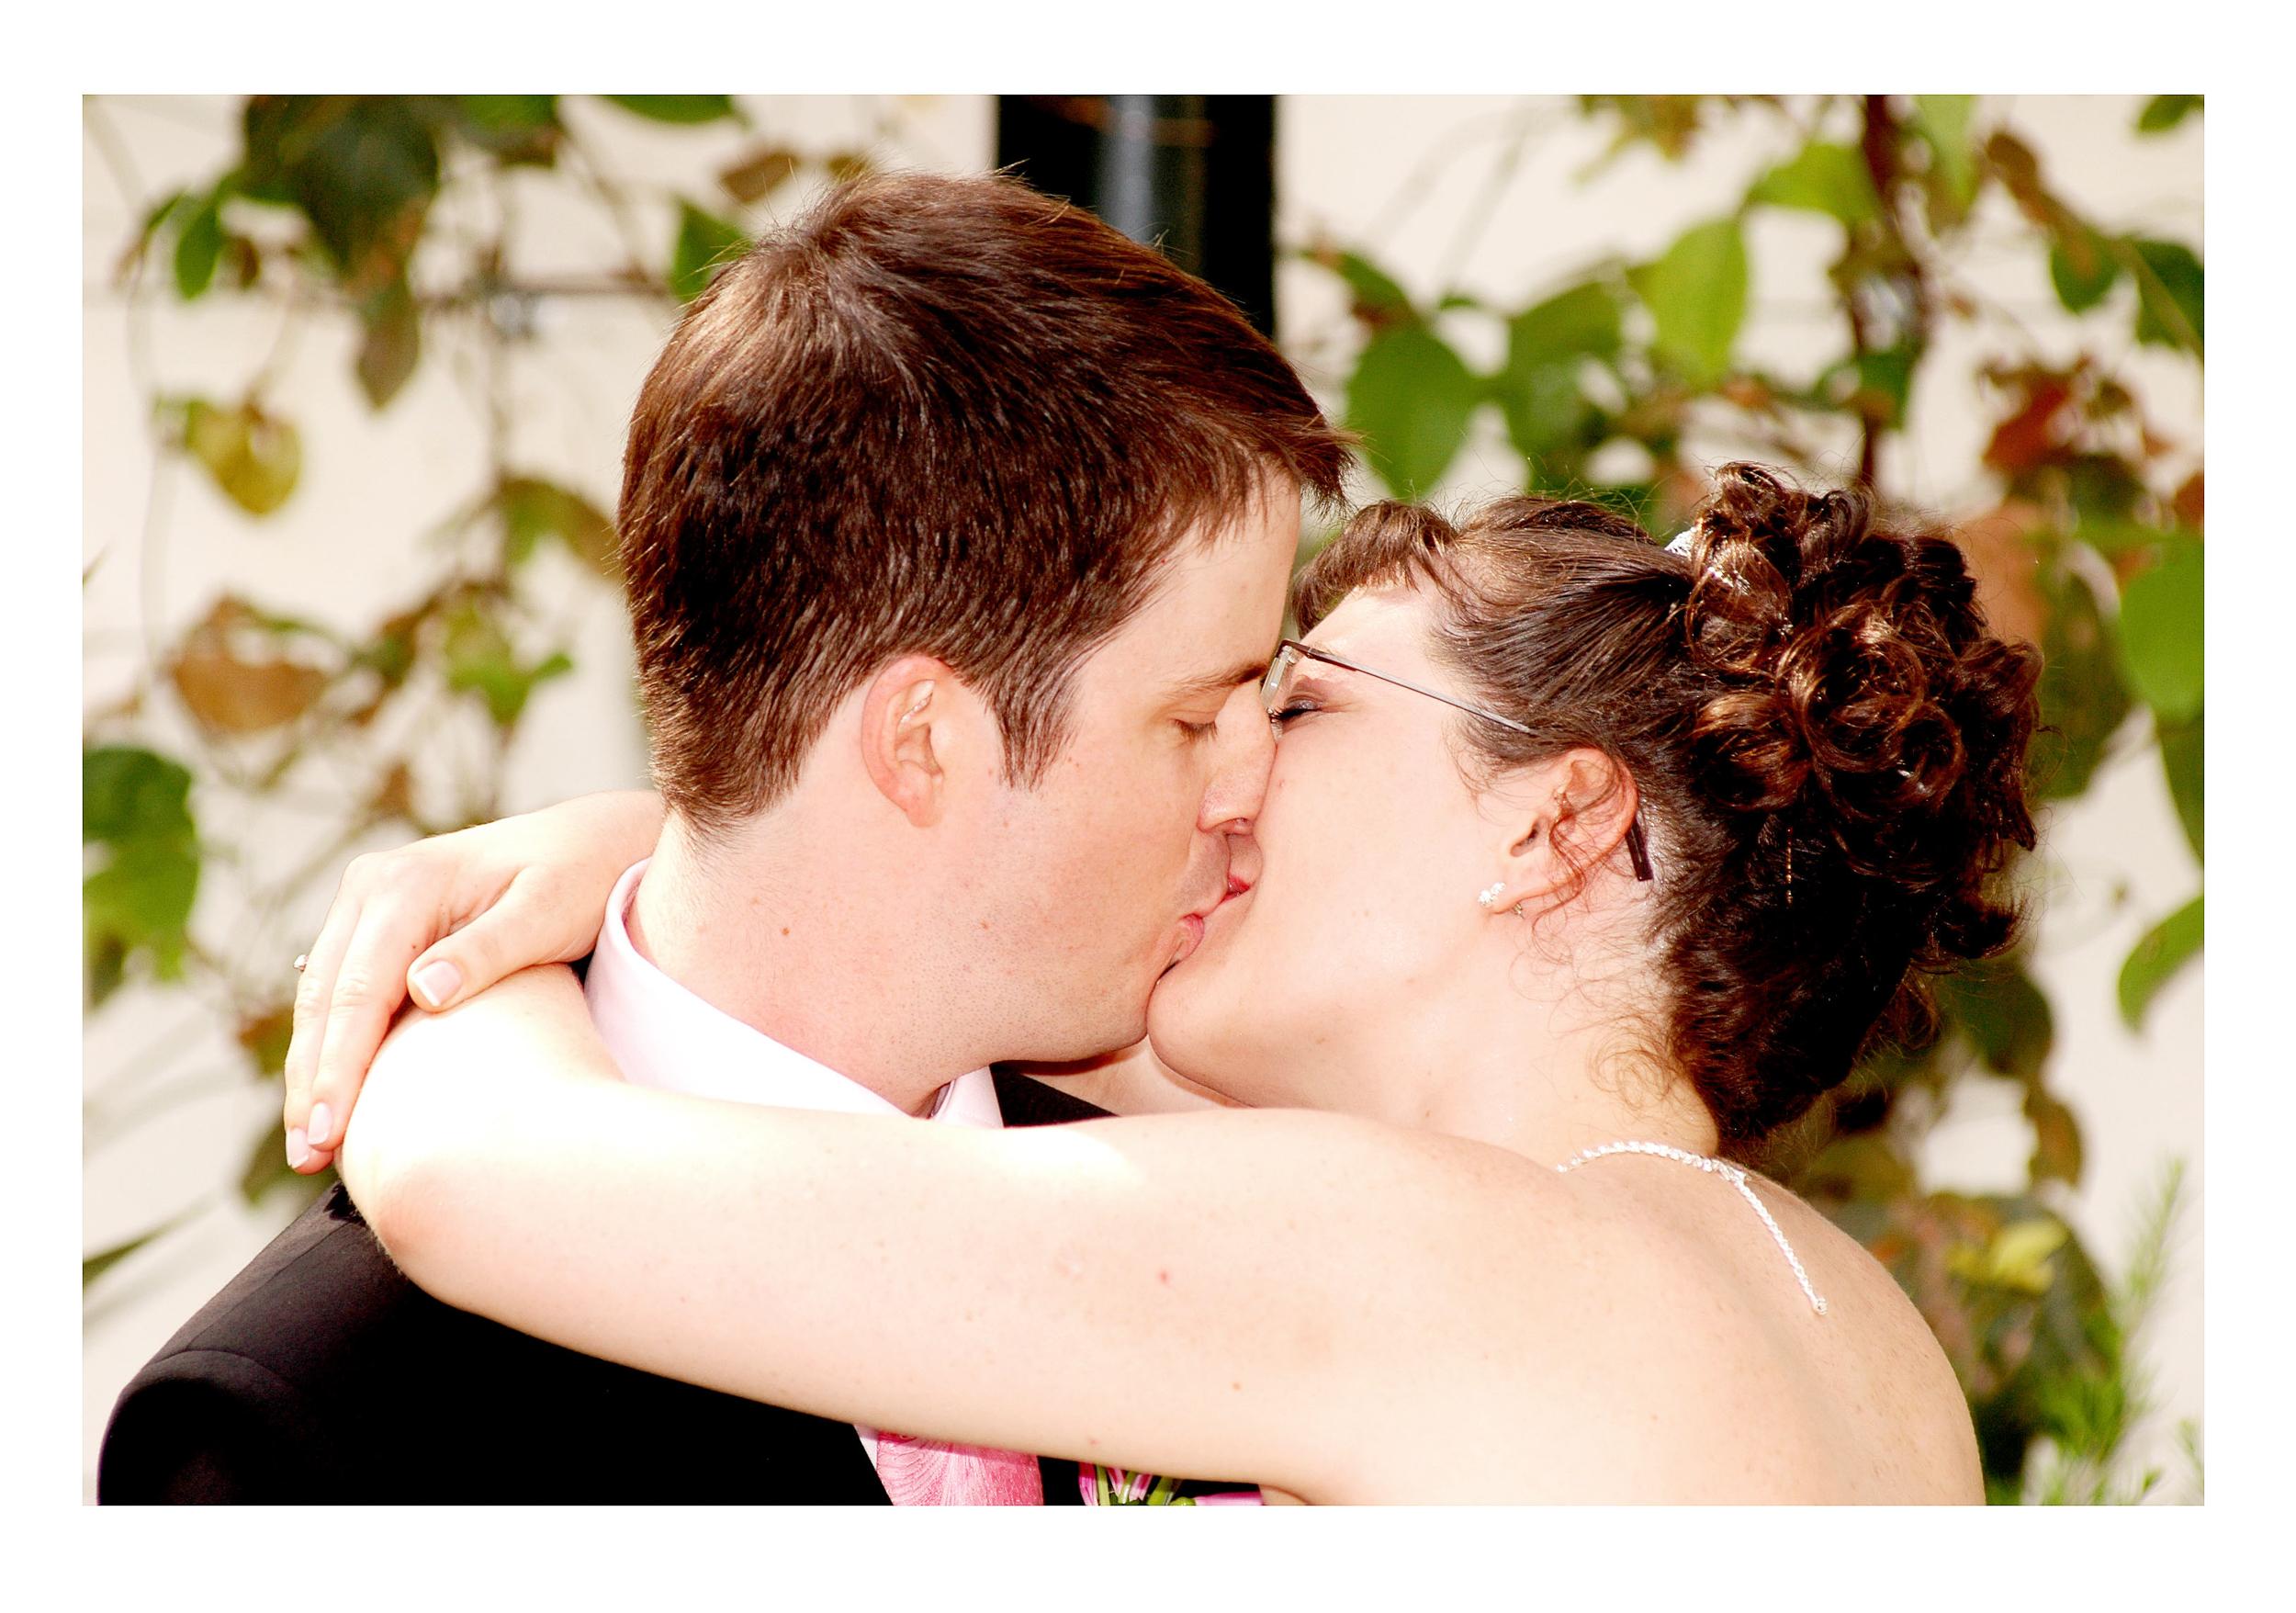 REPORTAGE-WEDDING-PHOTOGRAPHY-SET-UK-18.jpg